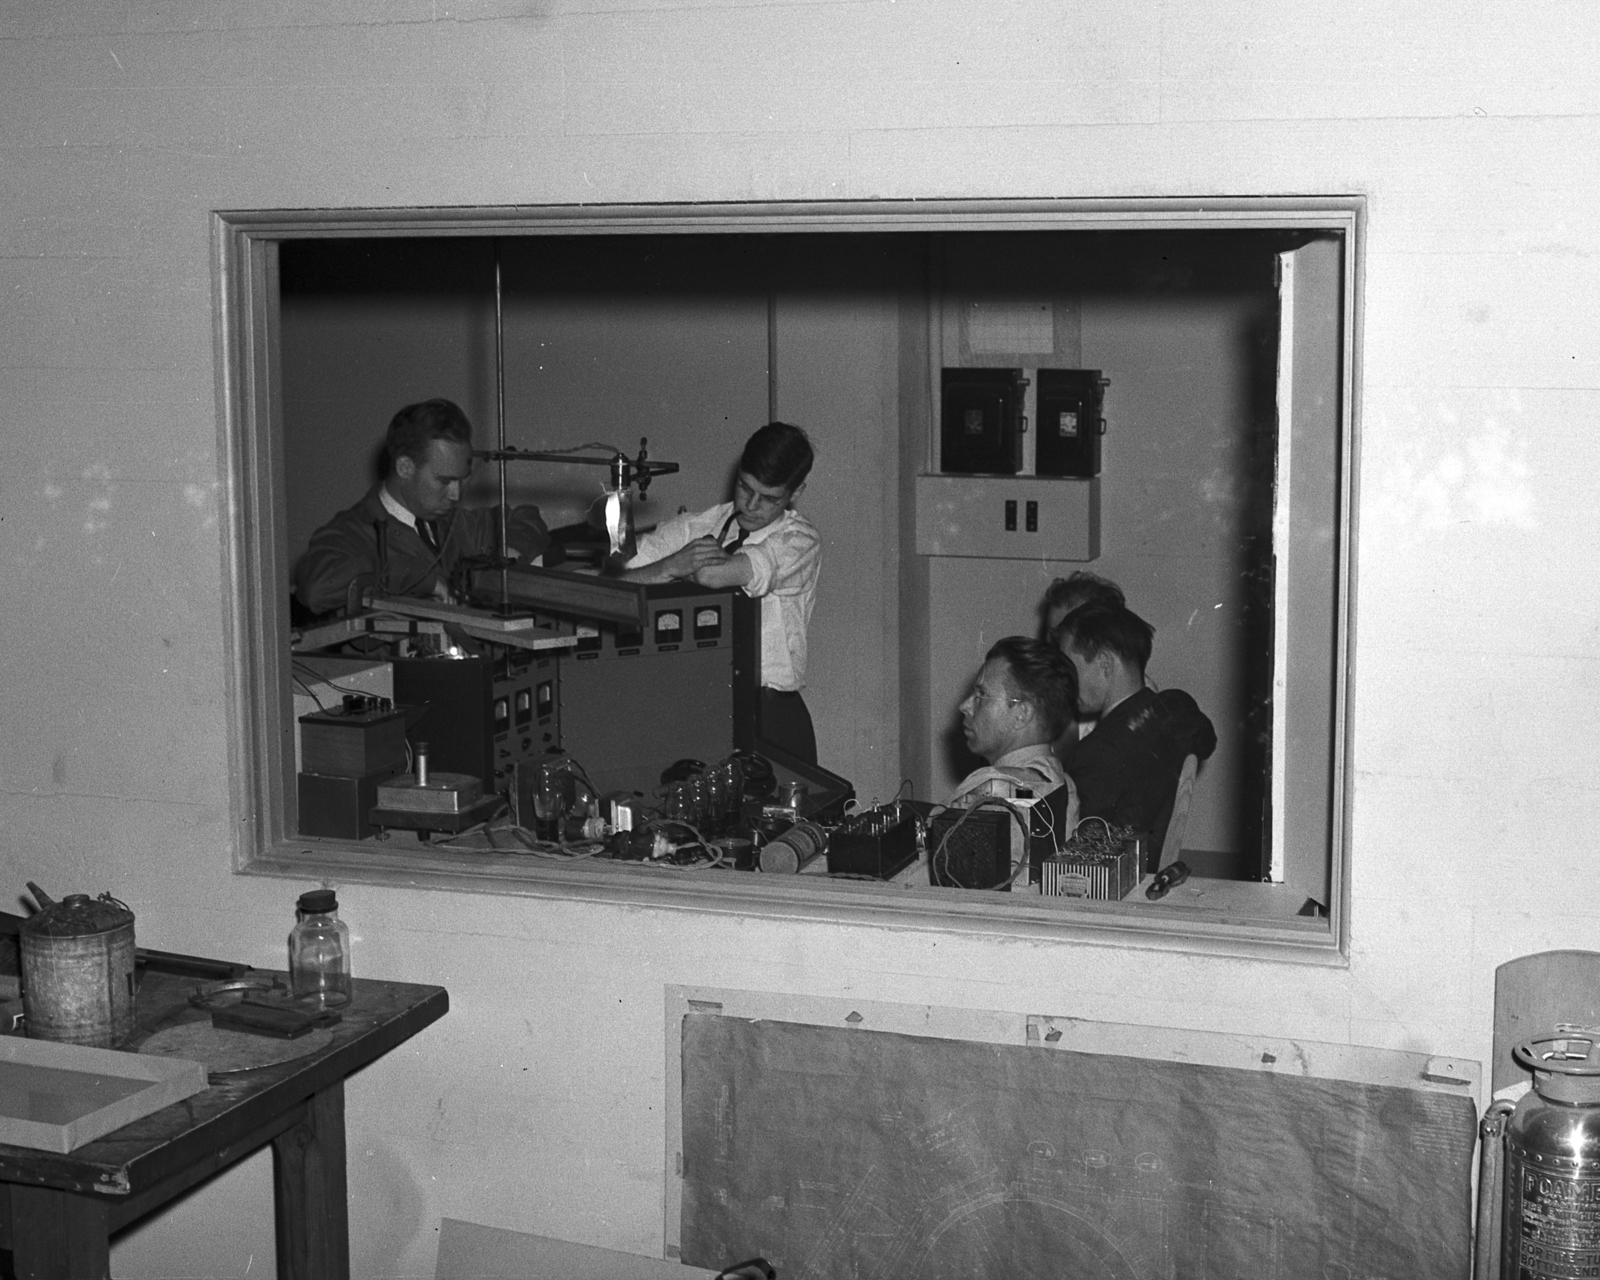 Control room window. Bill Brobeck, Wilson, Ernest Orlando Lawrence, Salisbury, and Edwin McMillan. June 12 ,1939. Cooksey 21 [Photographer: Donald Cooksey]